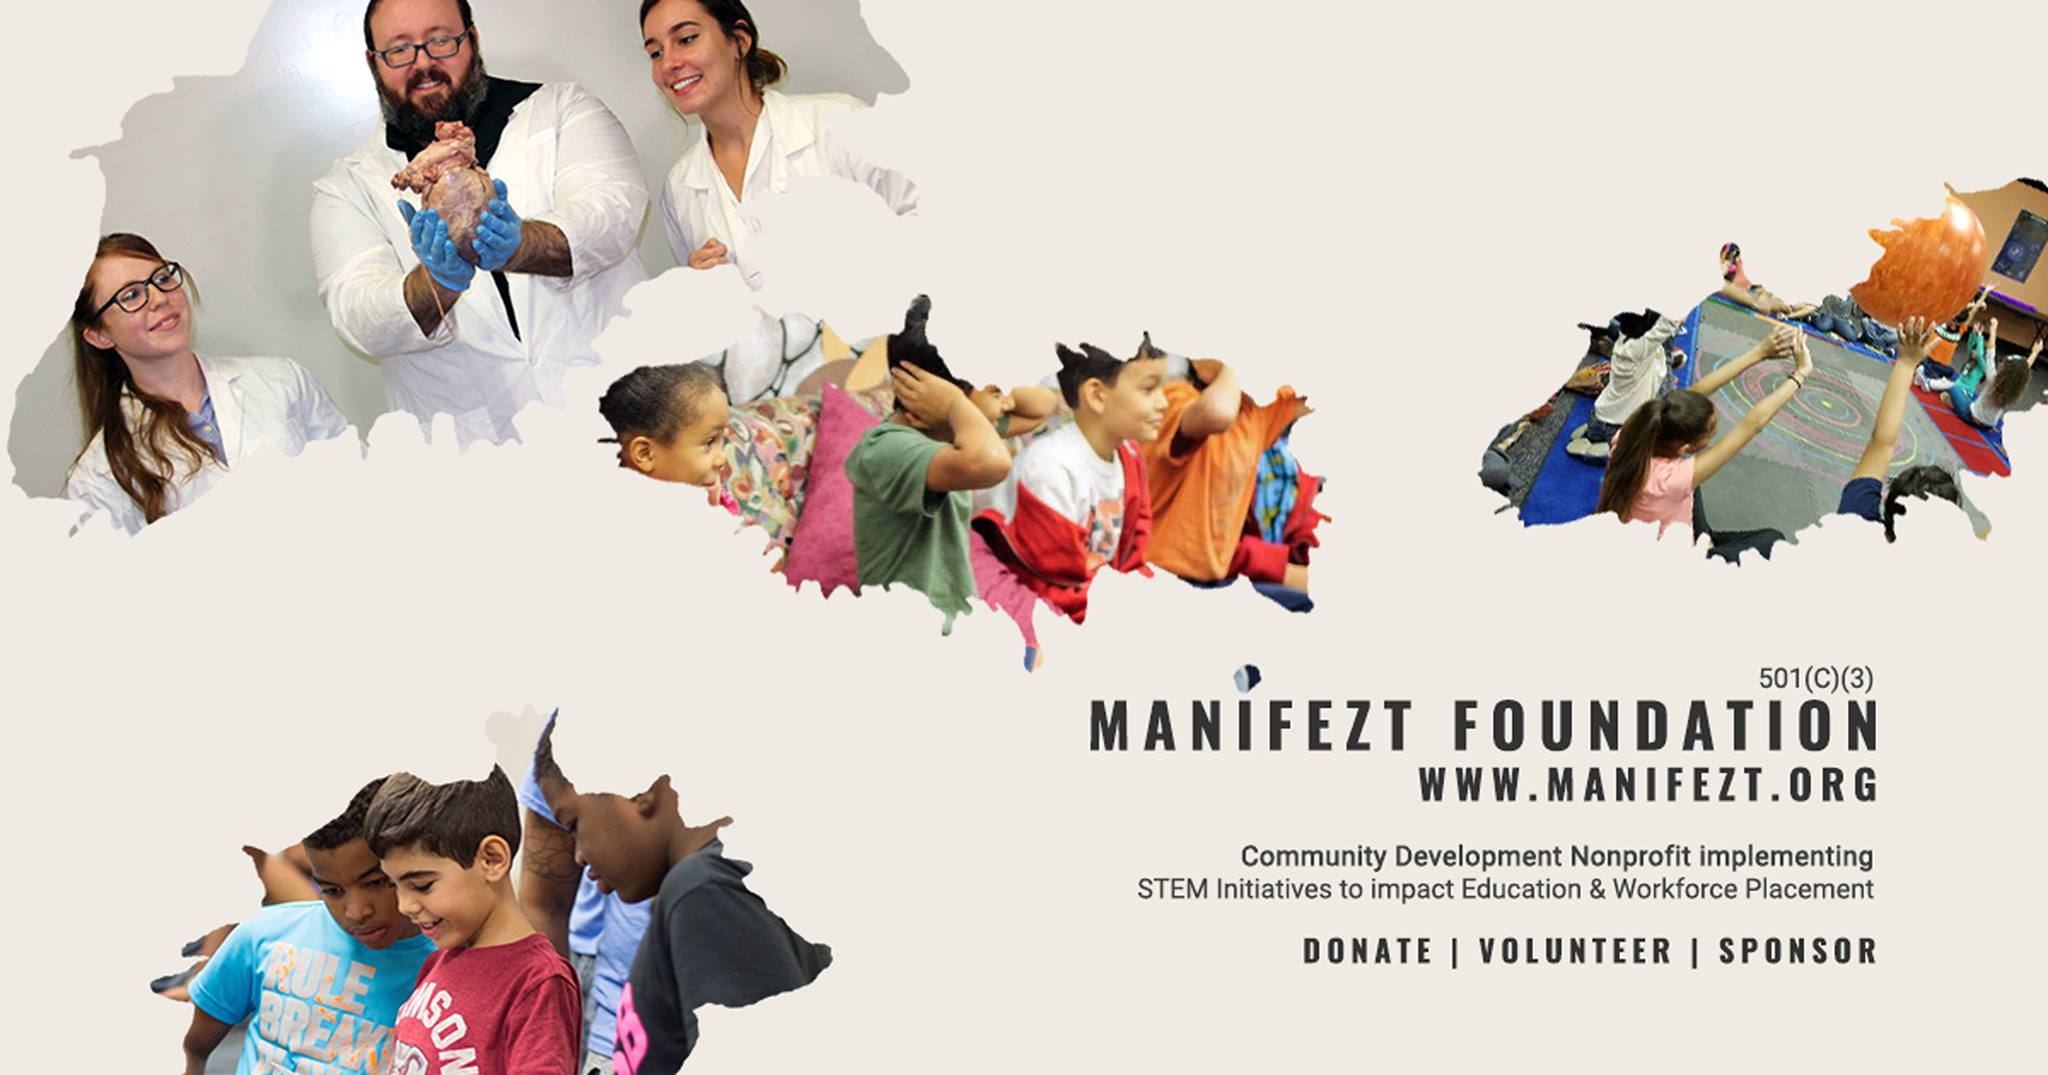 Donate to Manifezt Foundation Donate